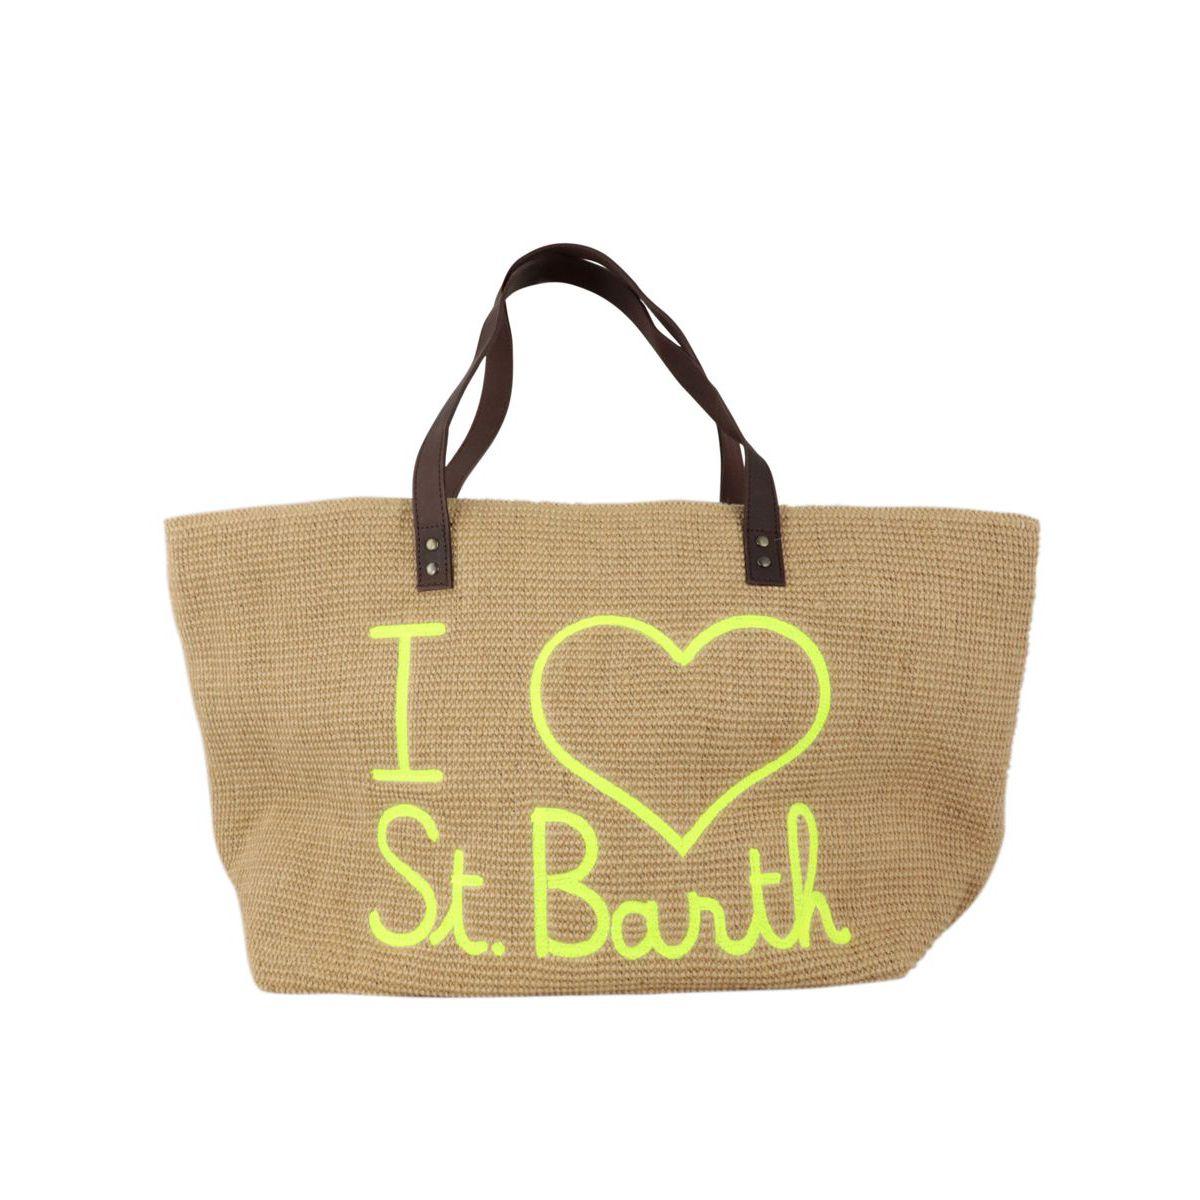 Helene jute bag with leather handles Sand MC2 Saint Barth